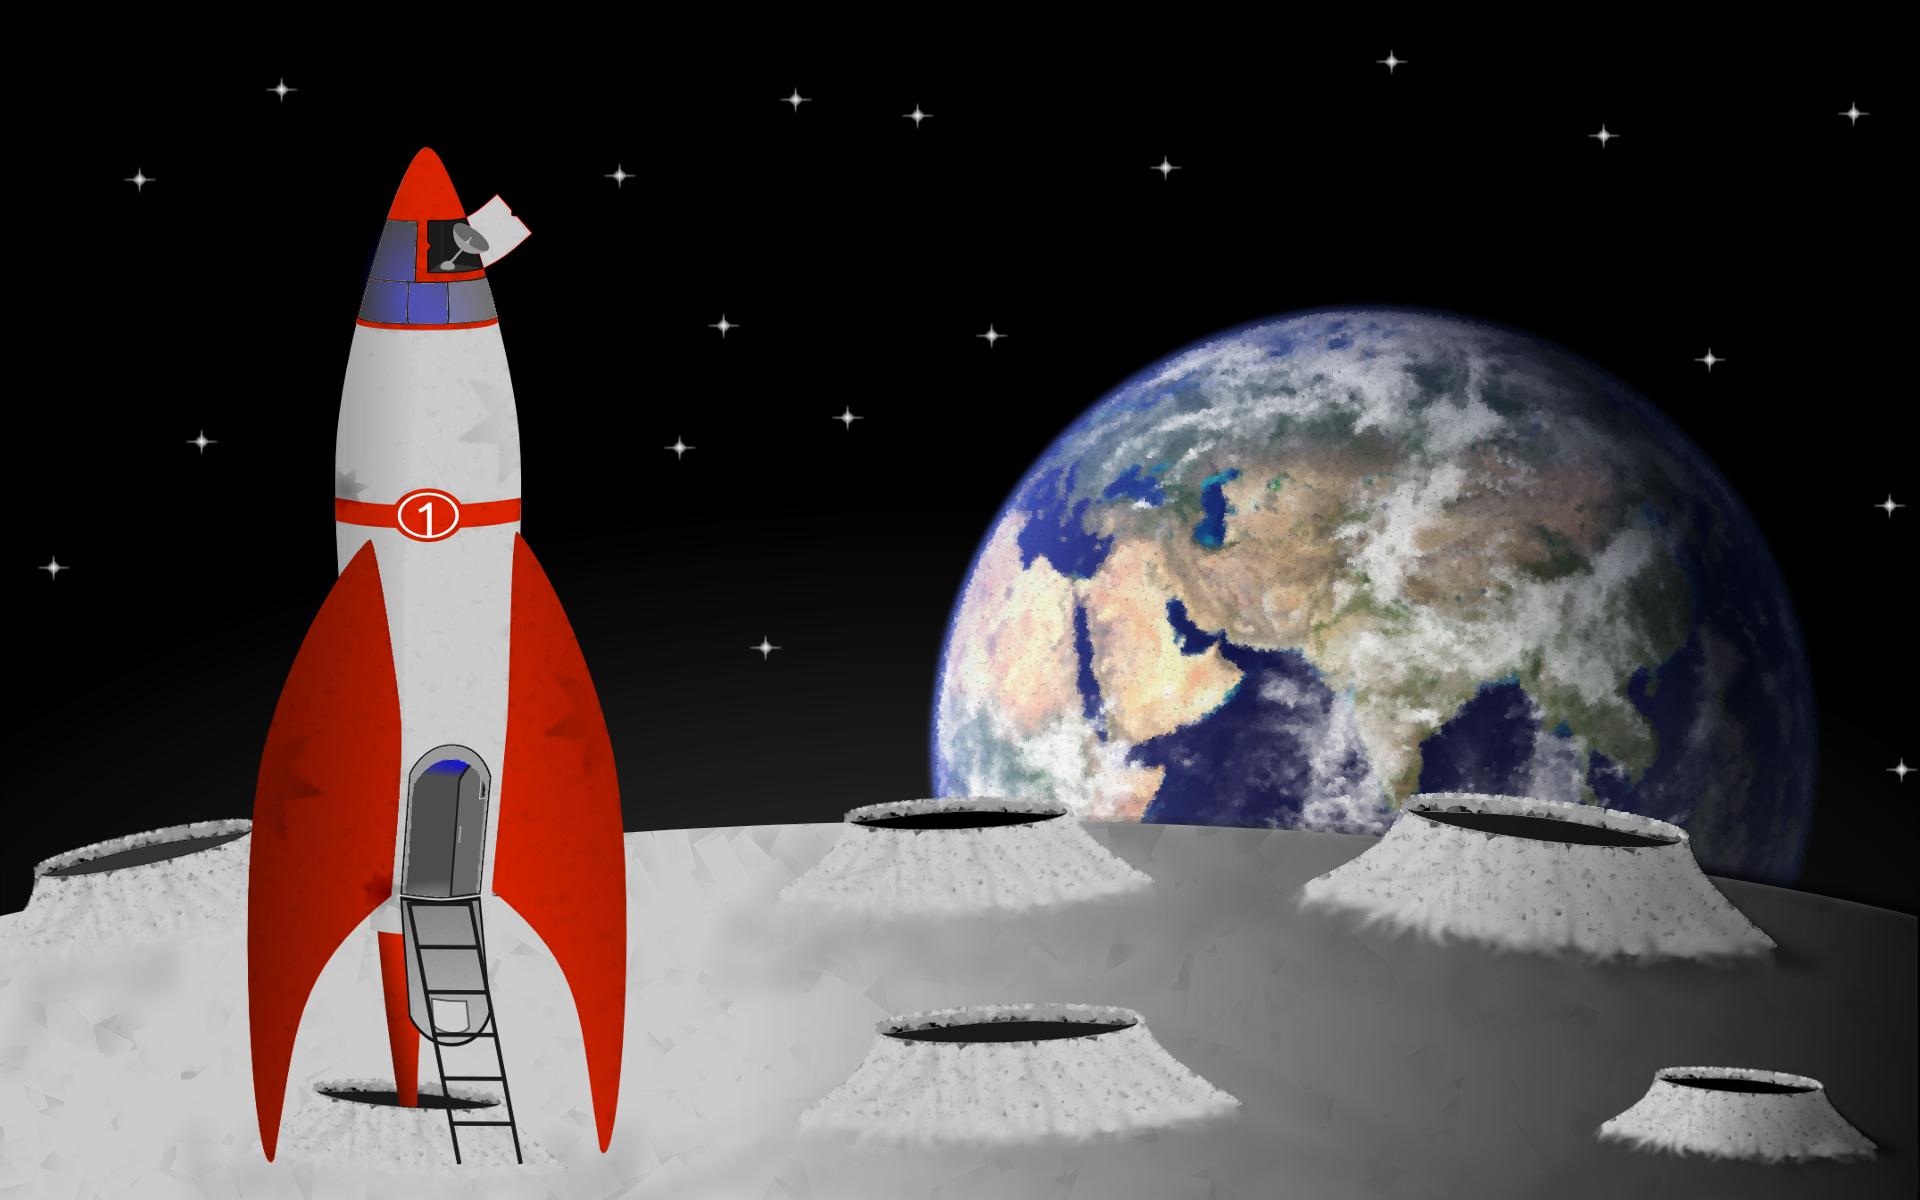 rocket landing on moon - photo #12